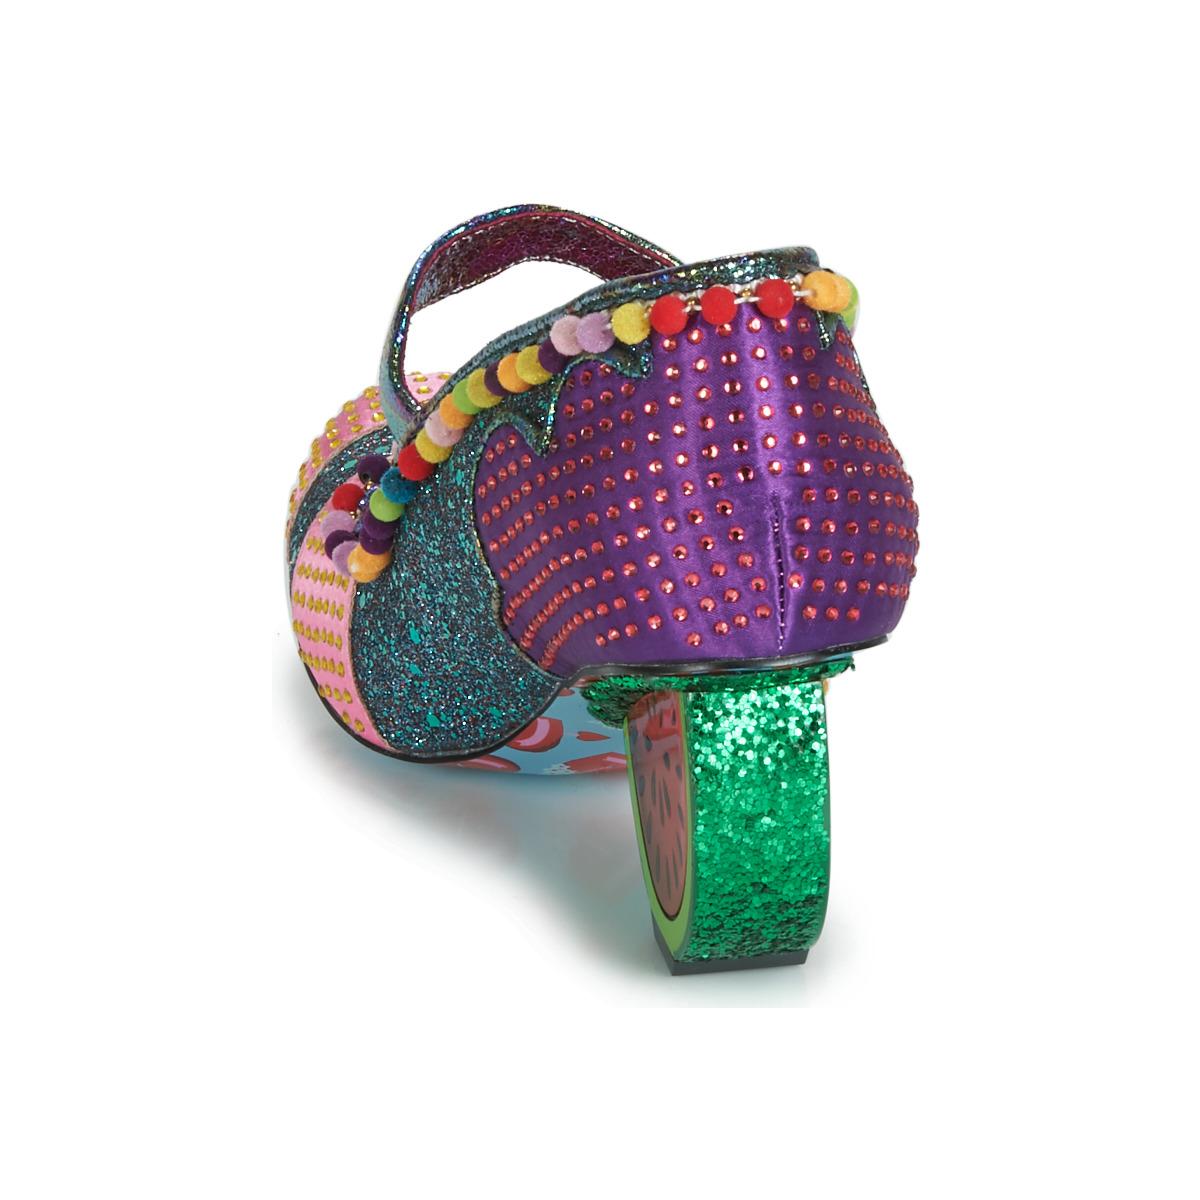 scarpe-donna-irregular-choice-fruit-punch-irregular-choice-5052224535559-4.jpg